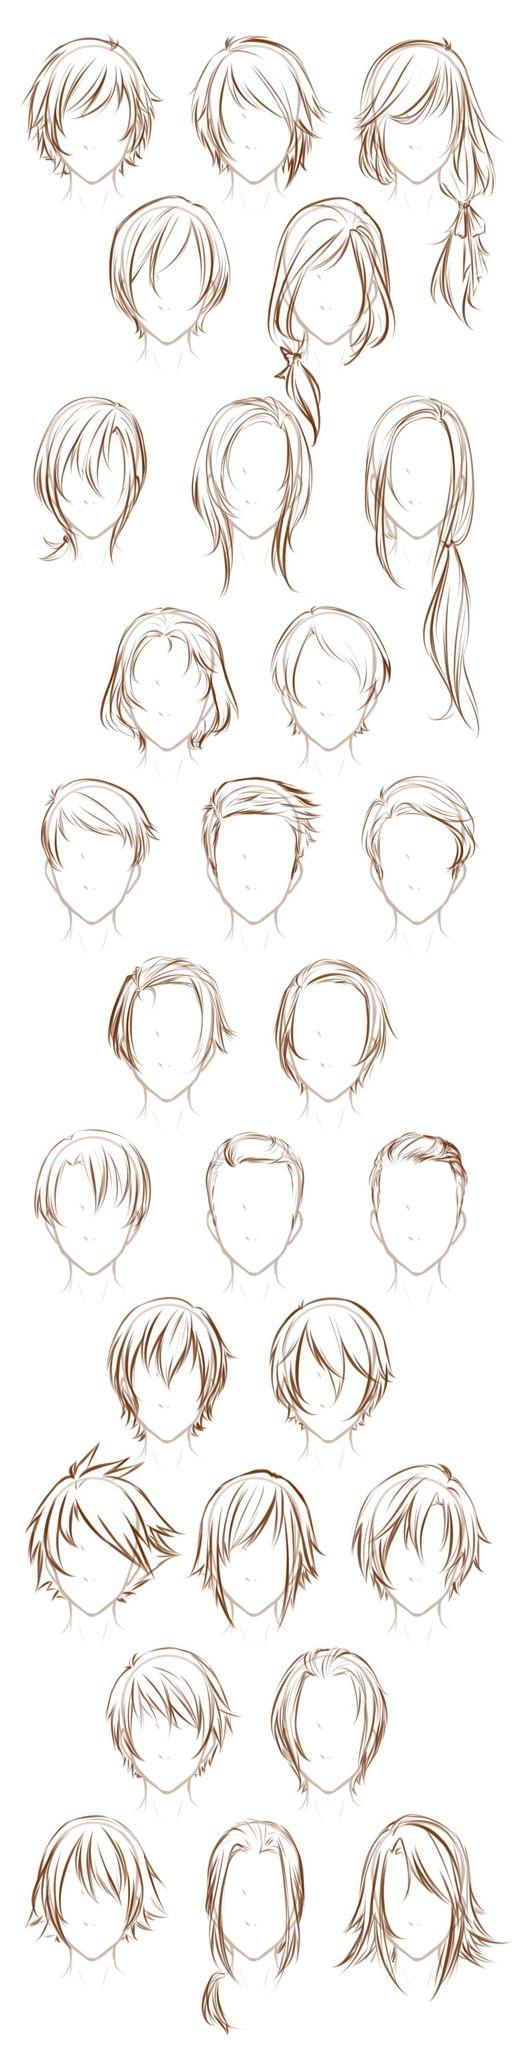 ~ COOL DRAWINGS ~ Hairstyles